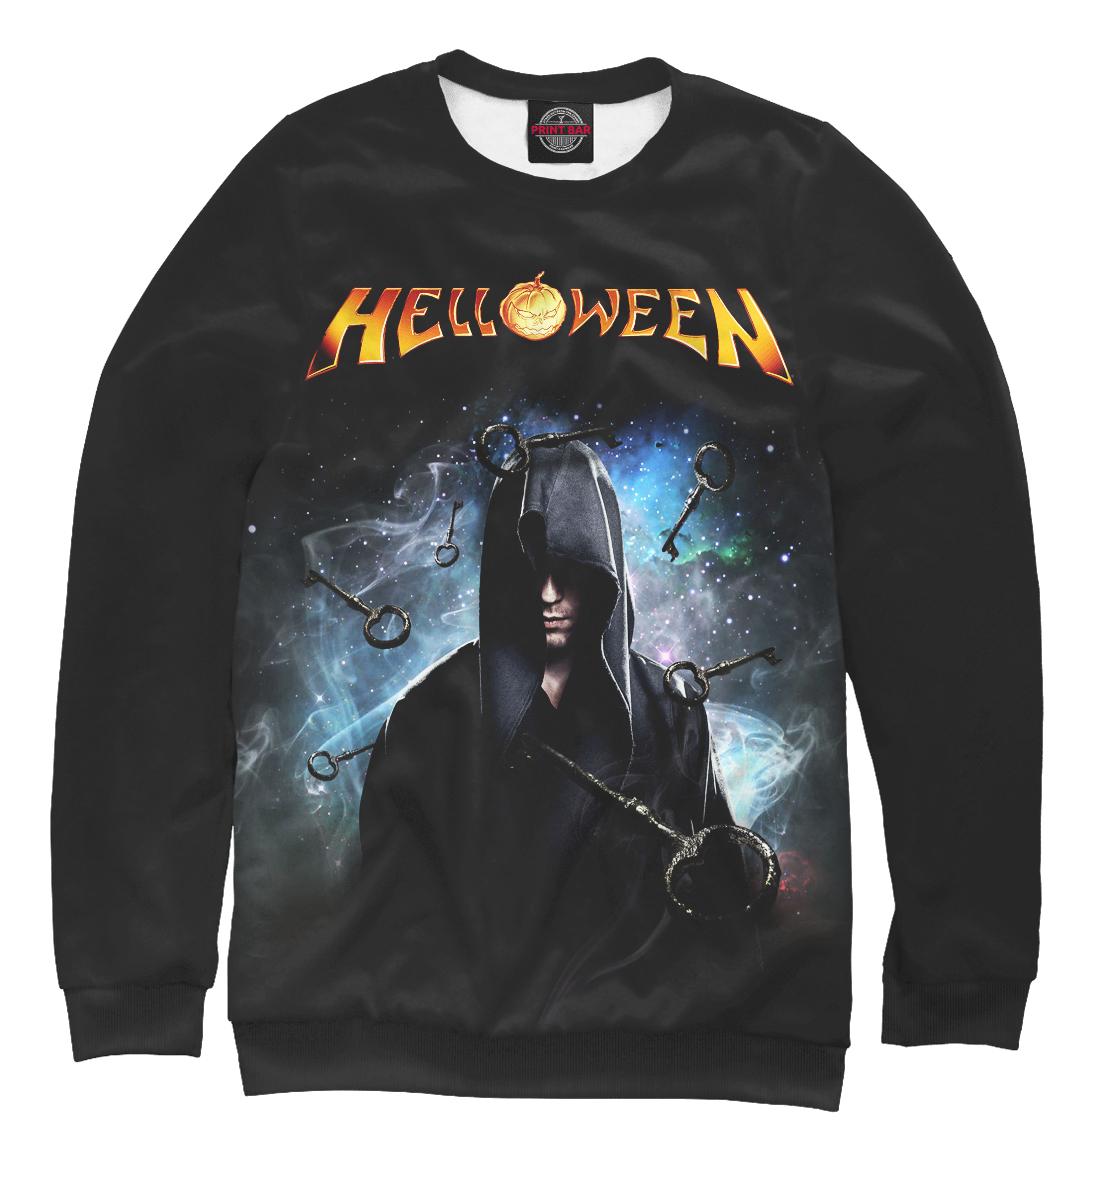 Купить Helloween, Printbar, Свитшоты, MZK-691865-swi-1